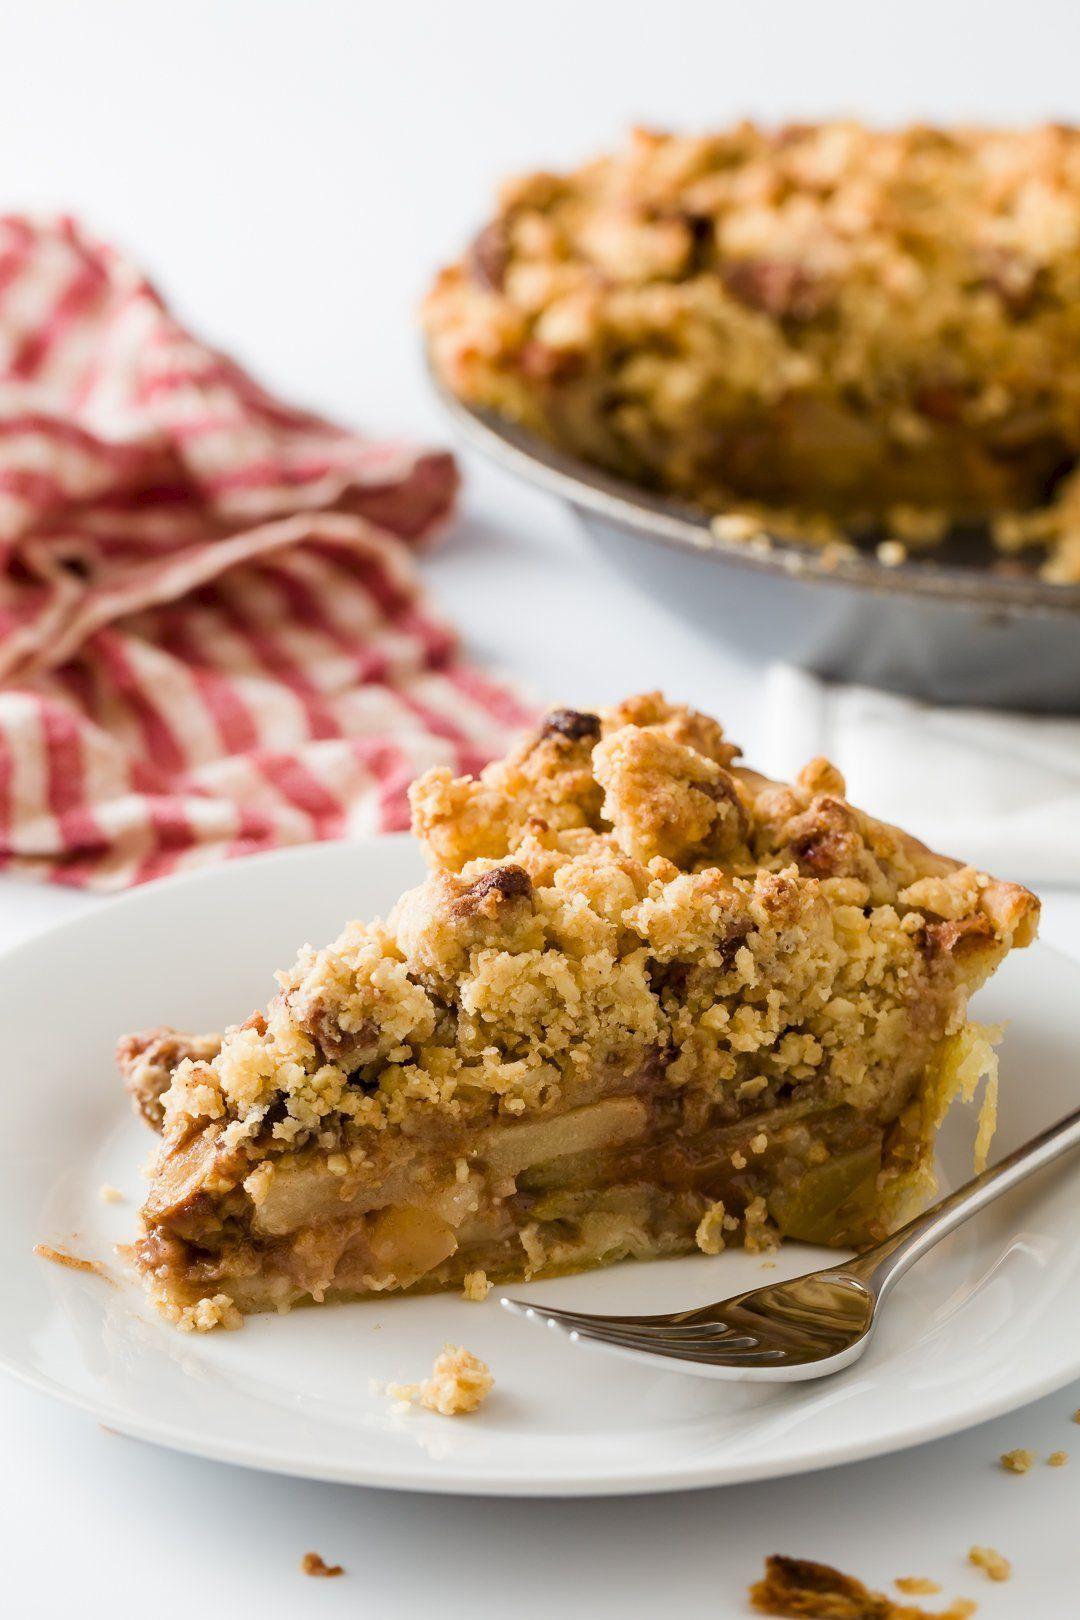 La mejor receta de tarta crumble de manzana